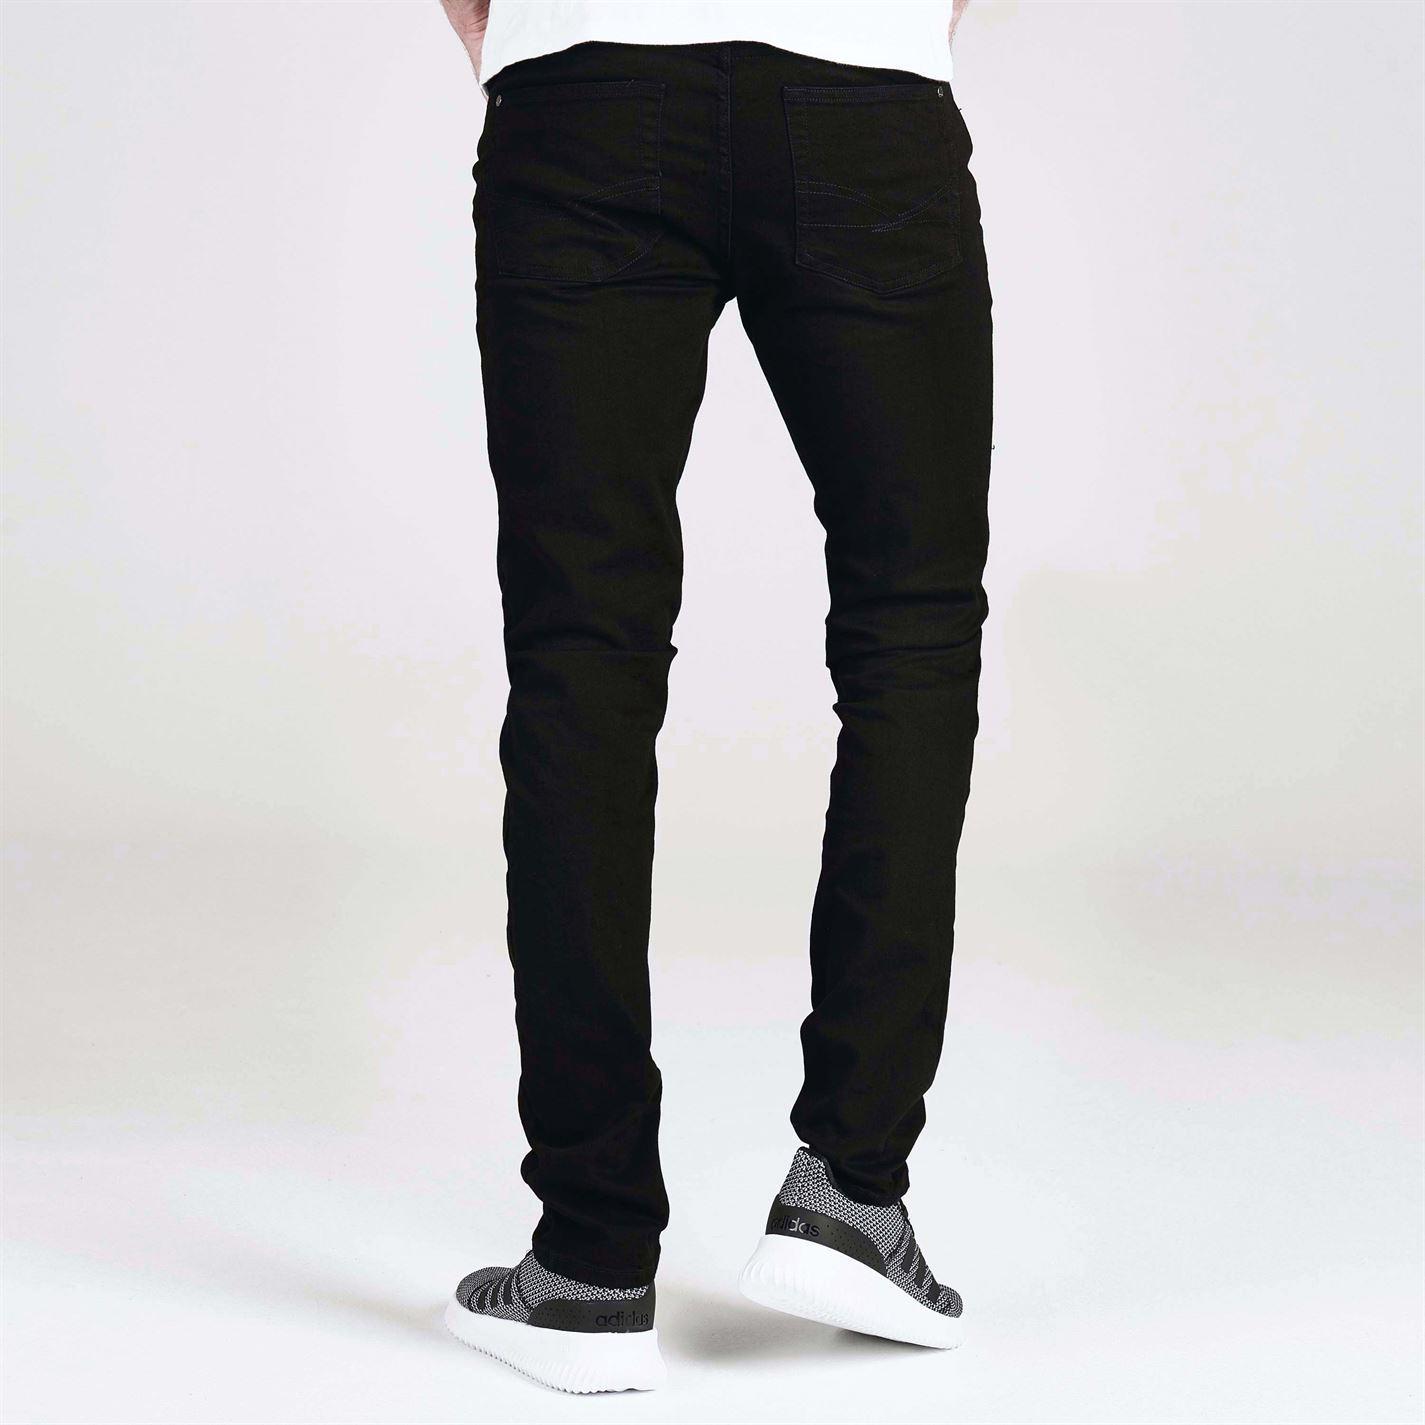 Jeans-Denim-Firetrap-Skinny-Mens-Trouser-Black thumbnail 10